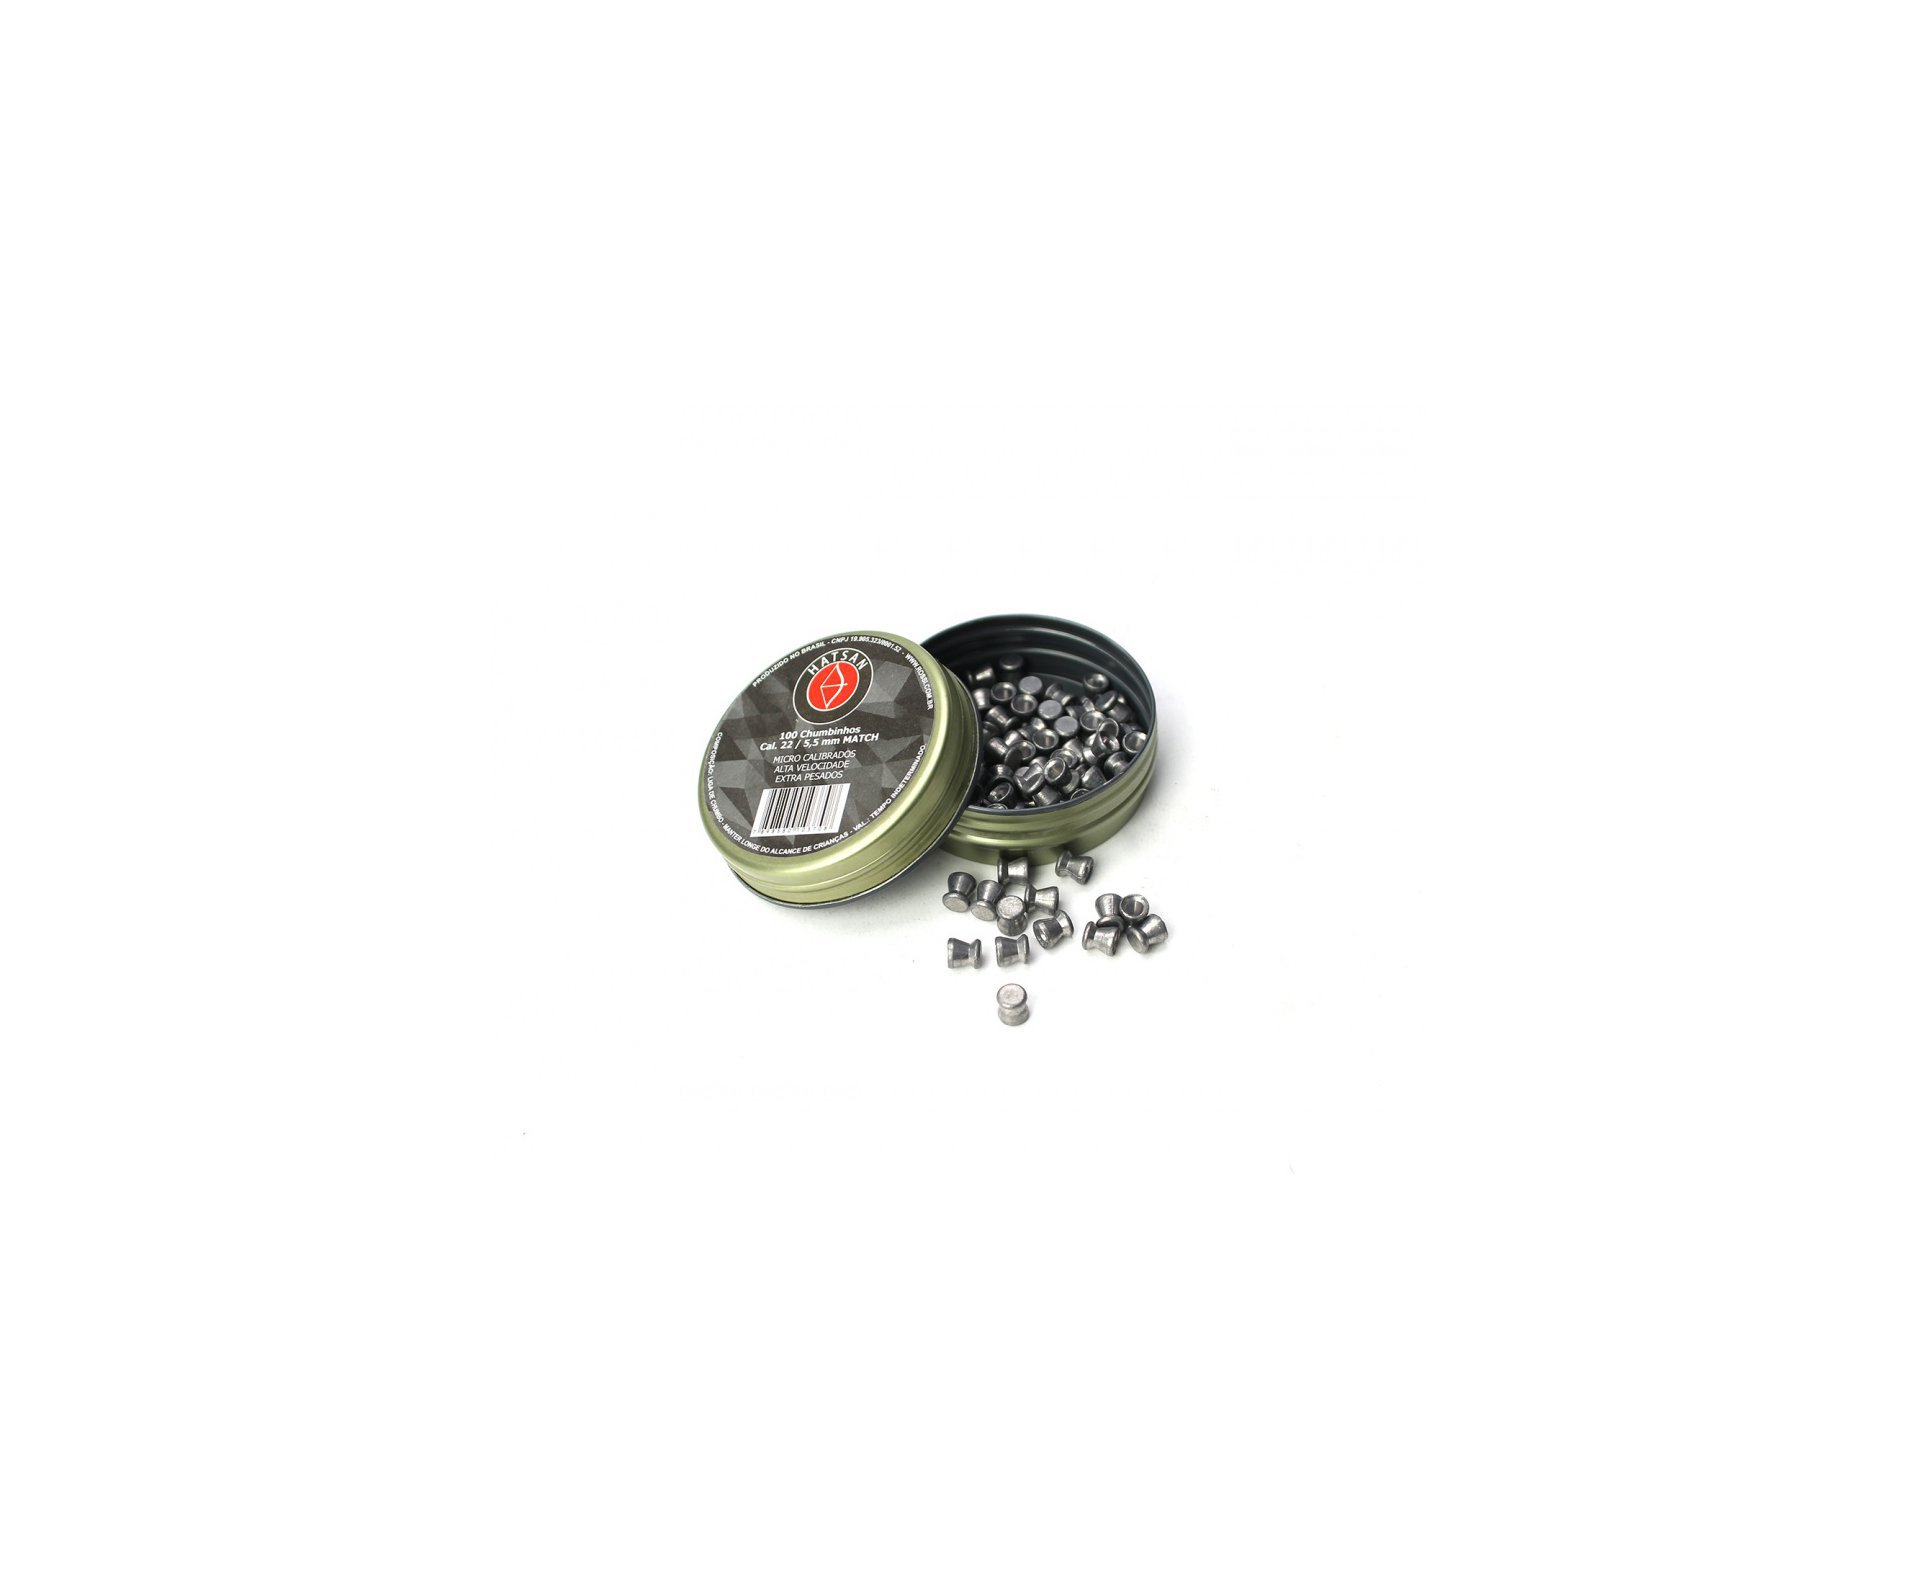 Carabina De Pressão Hatsan Strike Pd Gas Ram 60kg Combo Especial  Cal 5,5mm + Luneta 4x32 + Chumbinho + Case